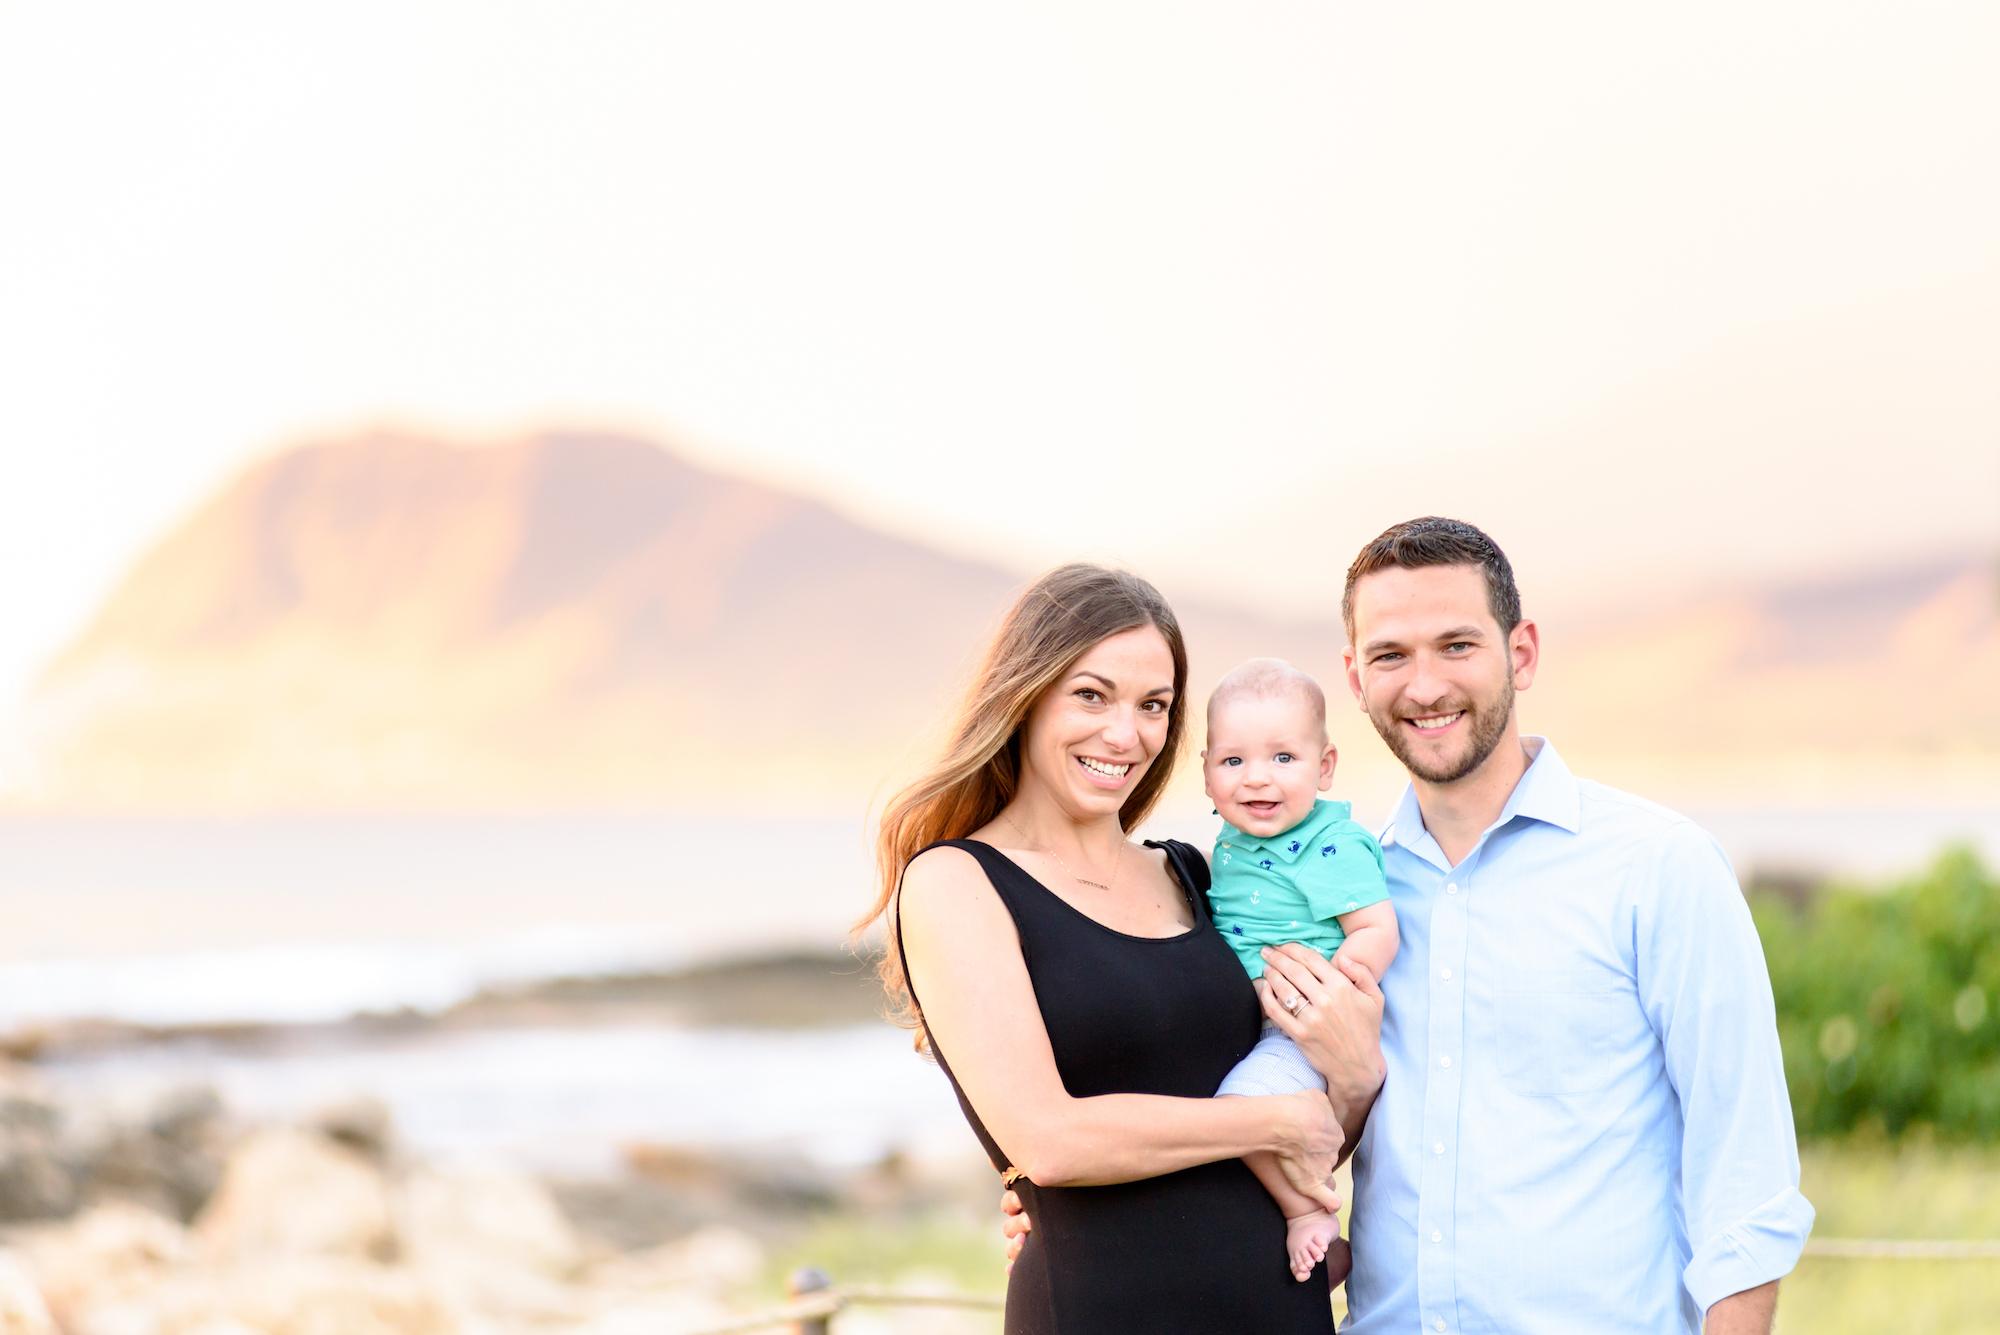 Oahu Family Portrait Photography, Four Seasons Resort Oahu at Ko Olina. Photo by Mayberry Multimedia